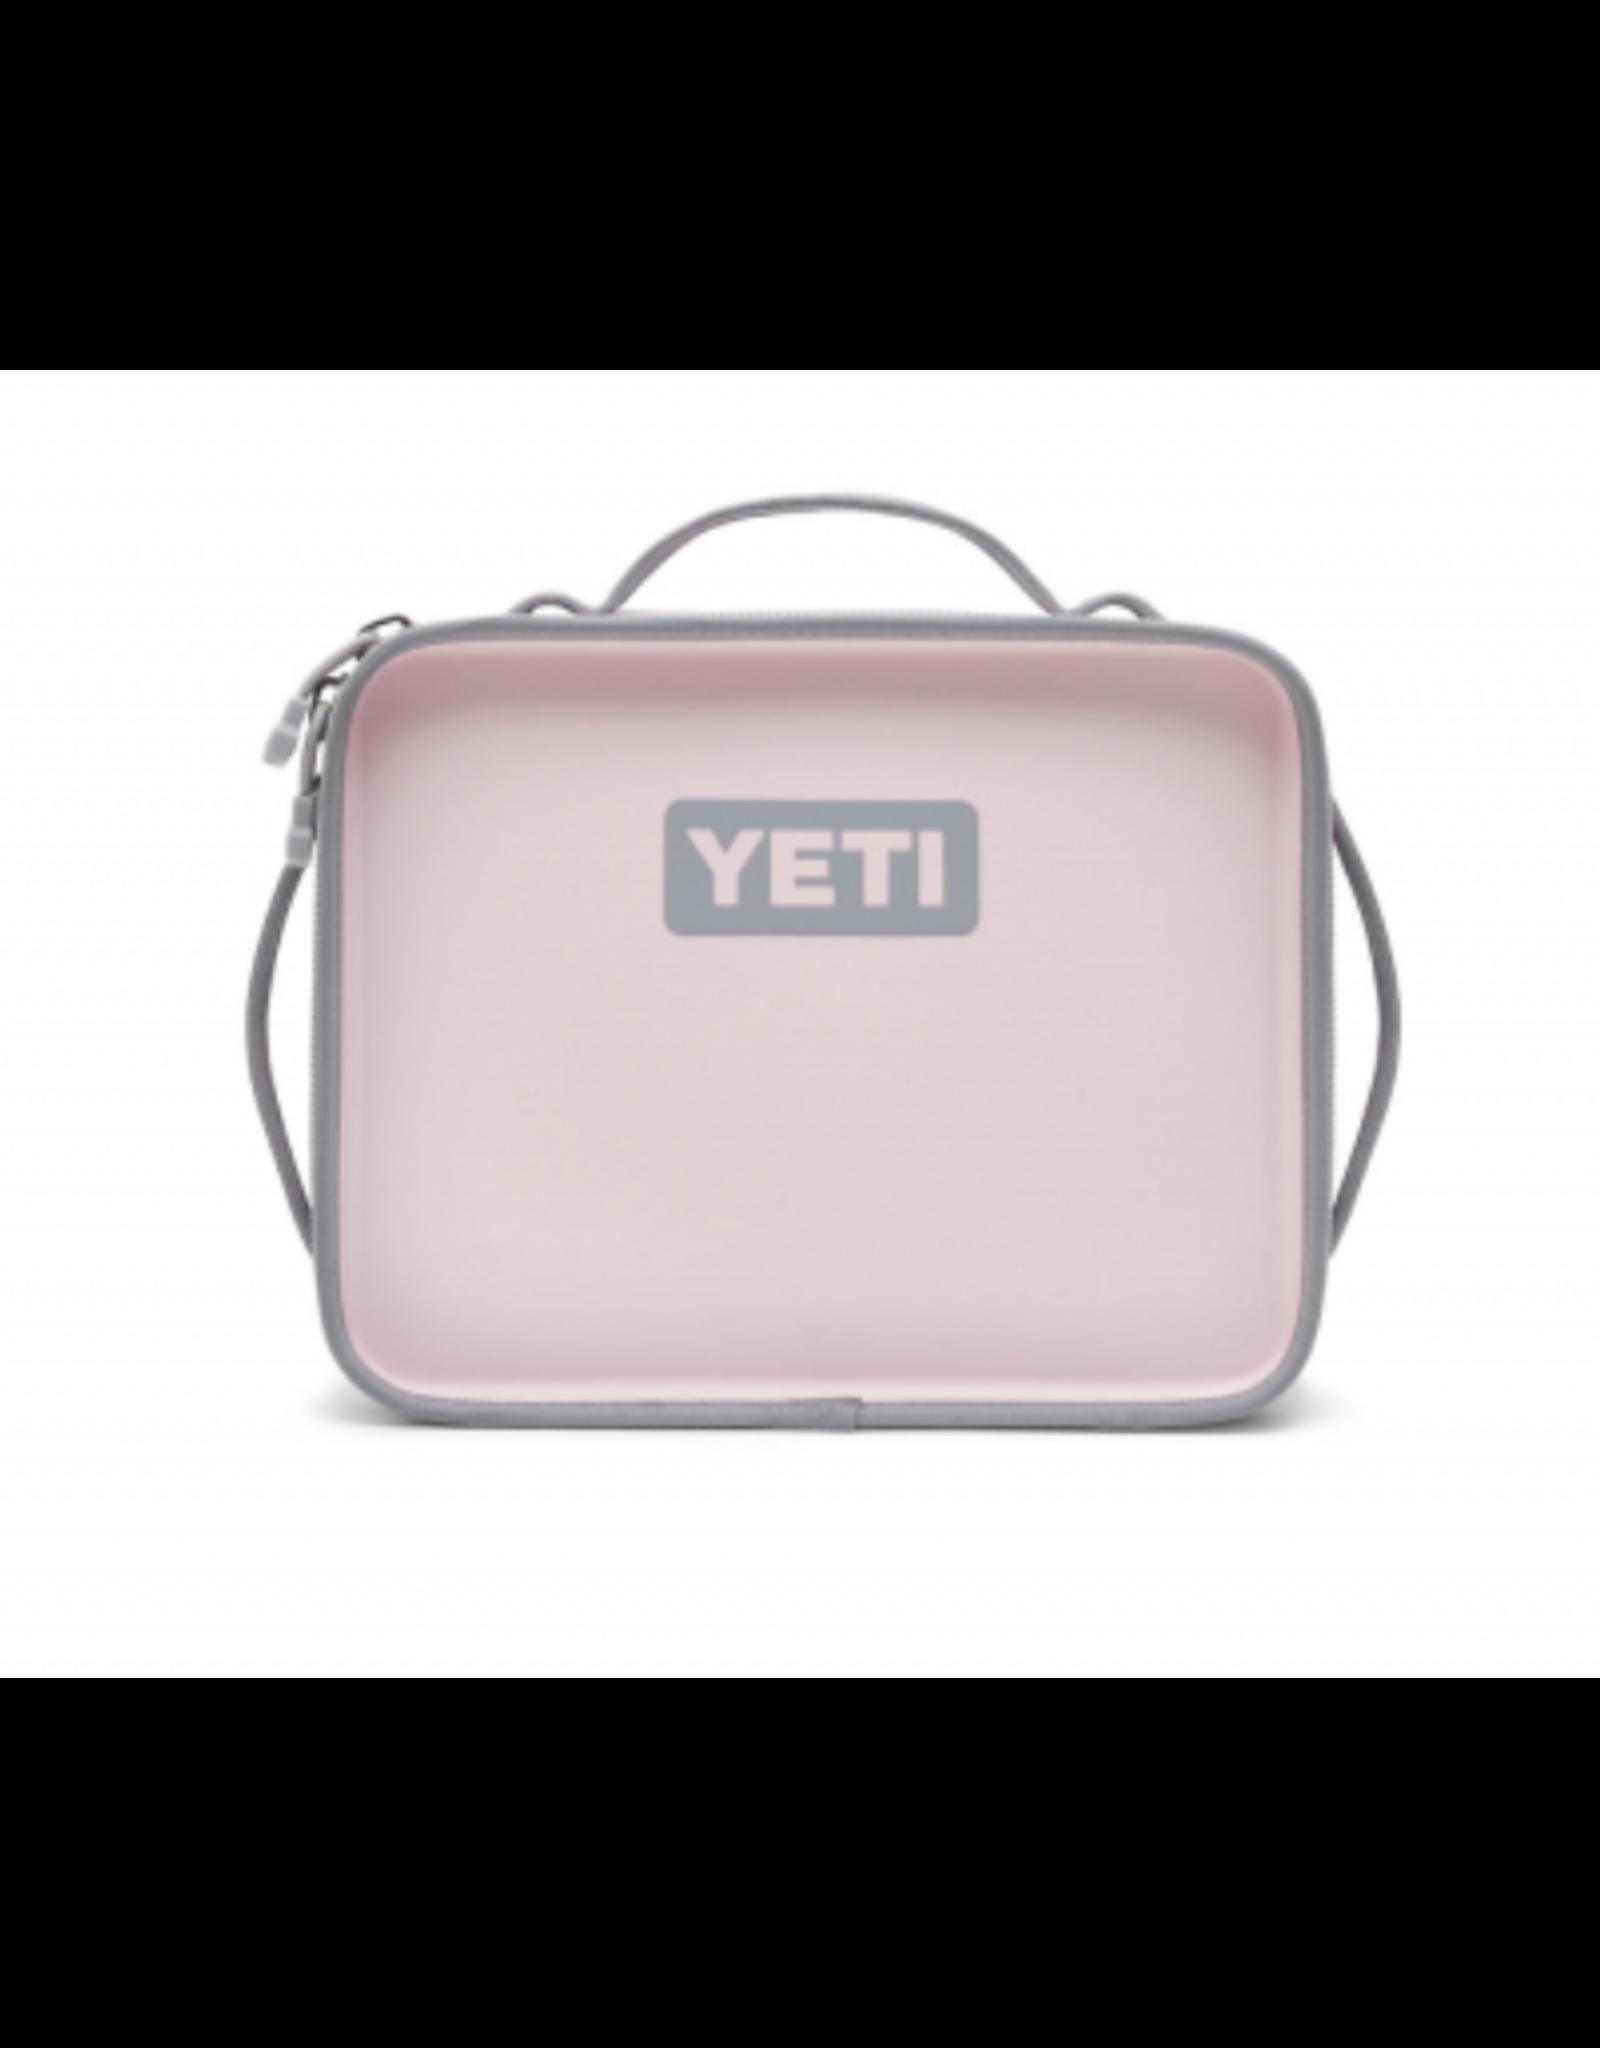 Yeti Daytrip Lunch Box Ice Pink